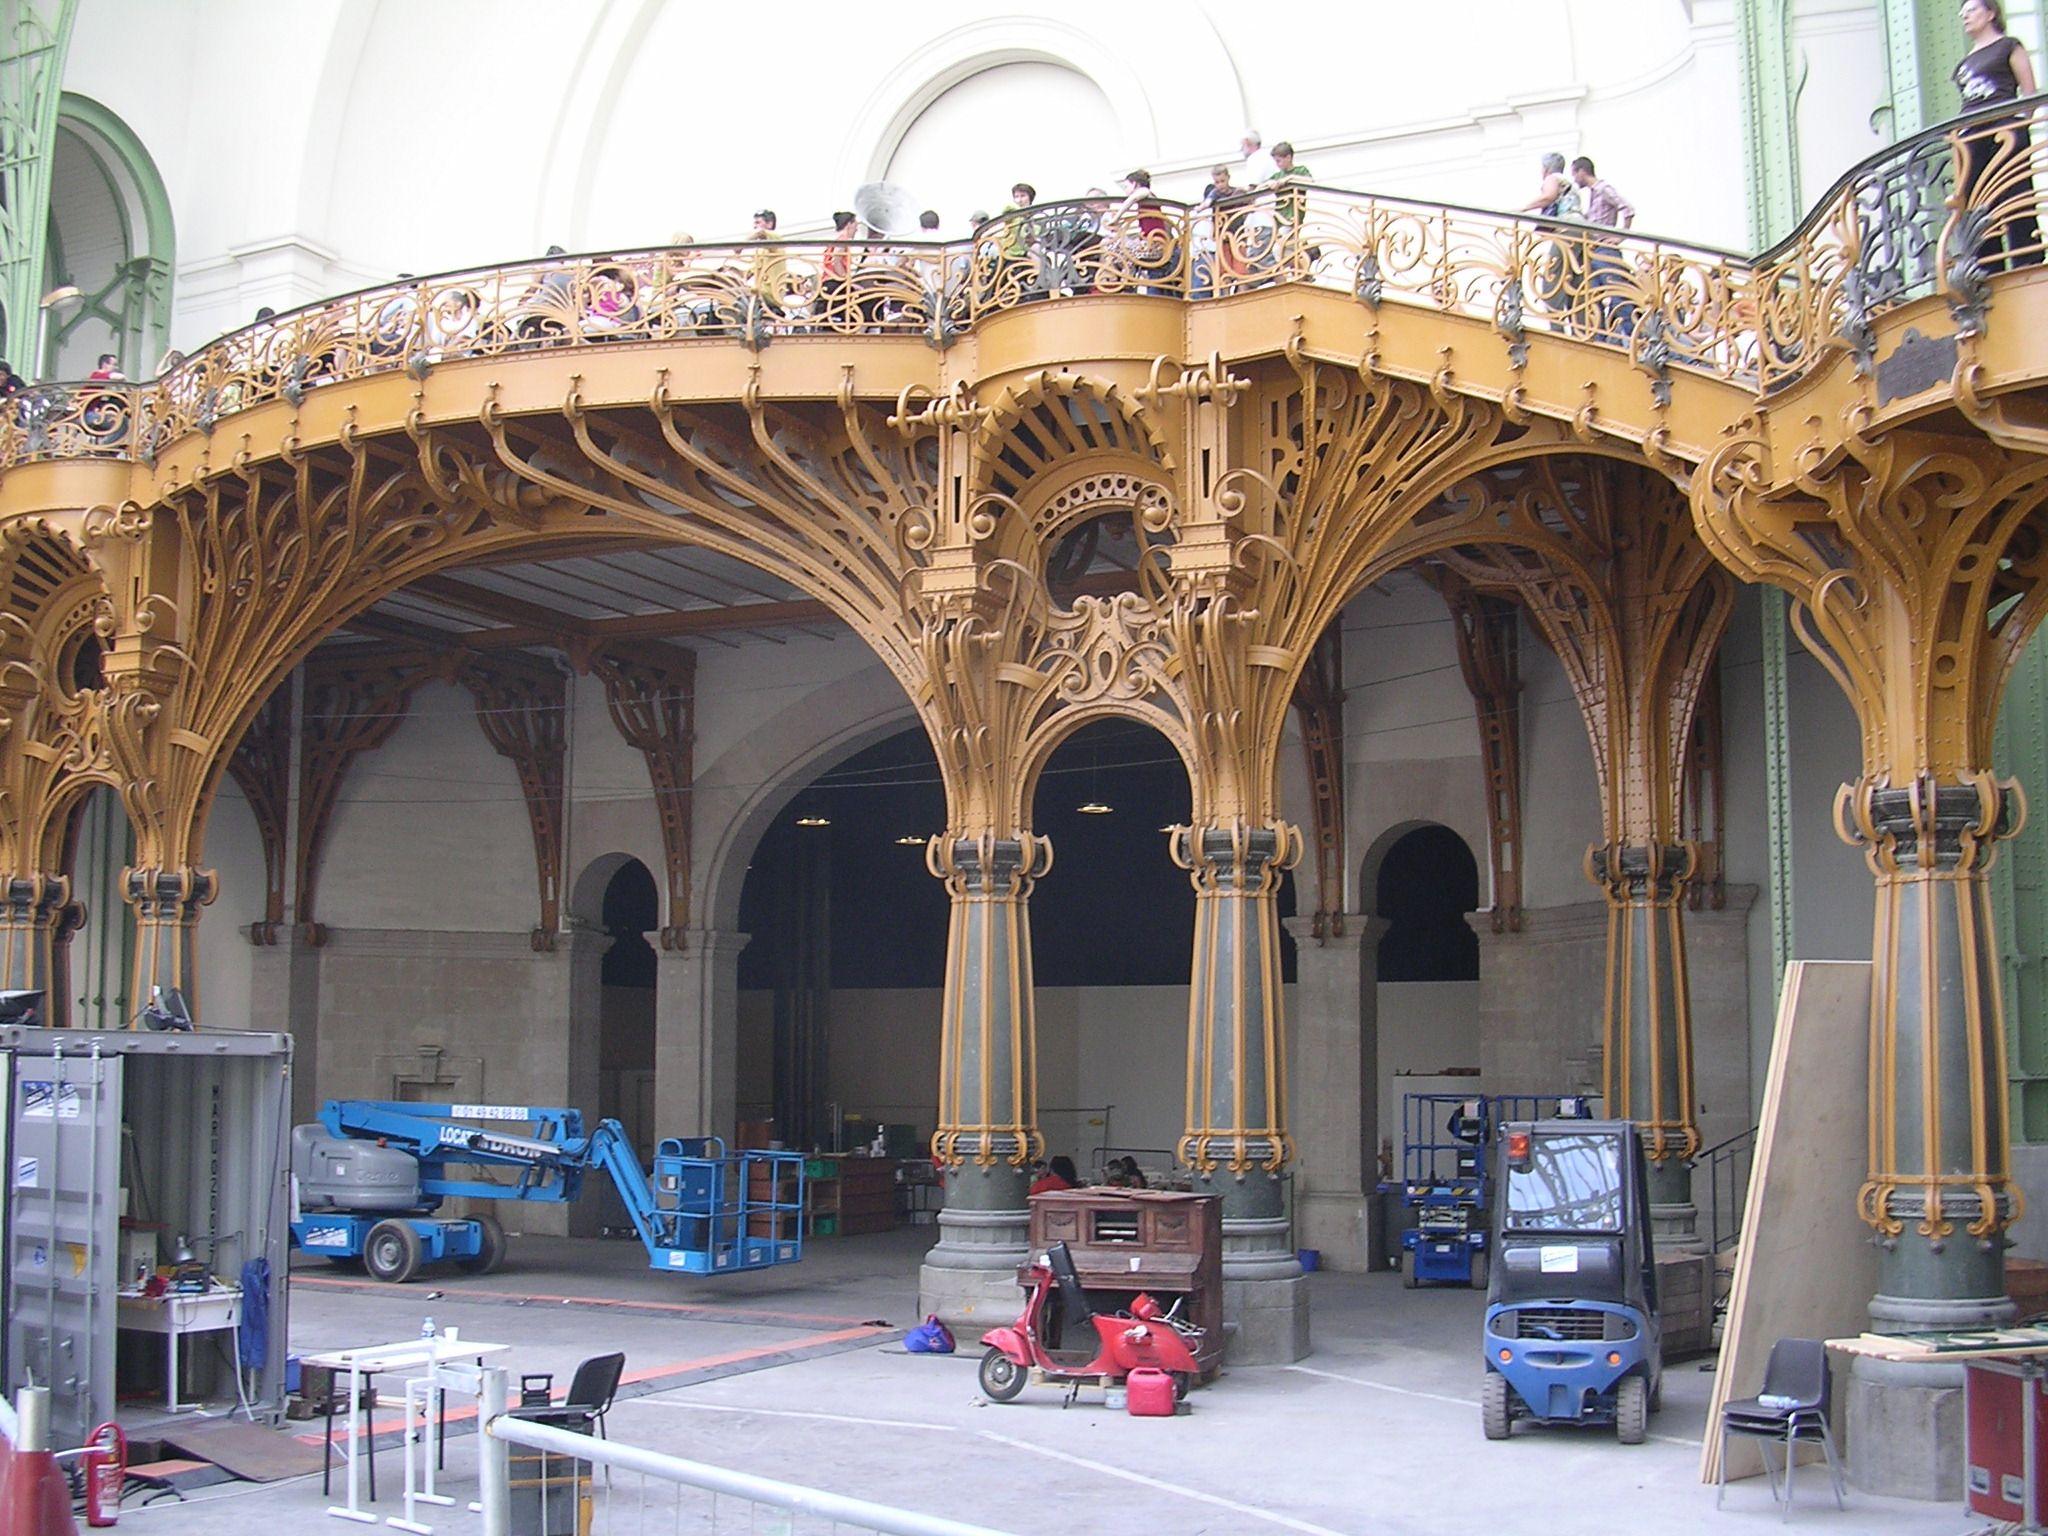 Best Kitchen Gallery: This Prime Ex Le Of Art Nouveau In Architecture Is Found In Paris of Art Nouveau Architecture on rachelxblog.com